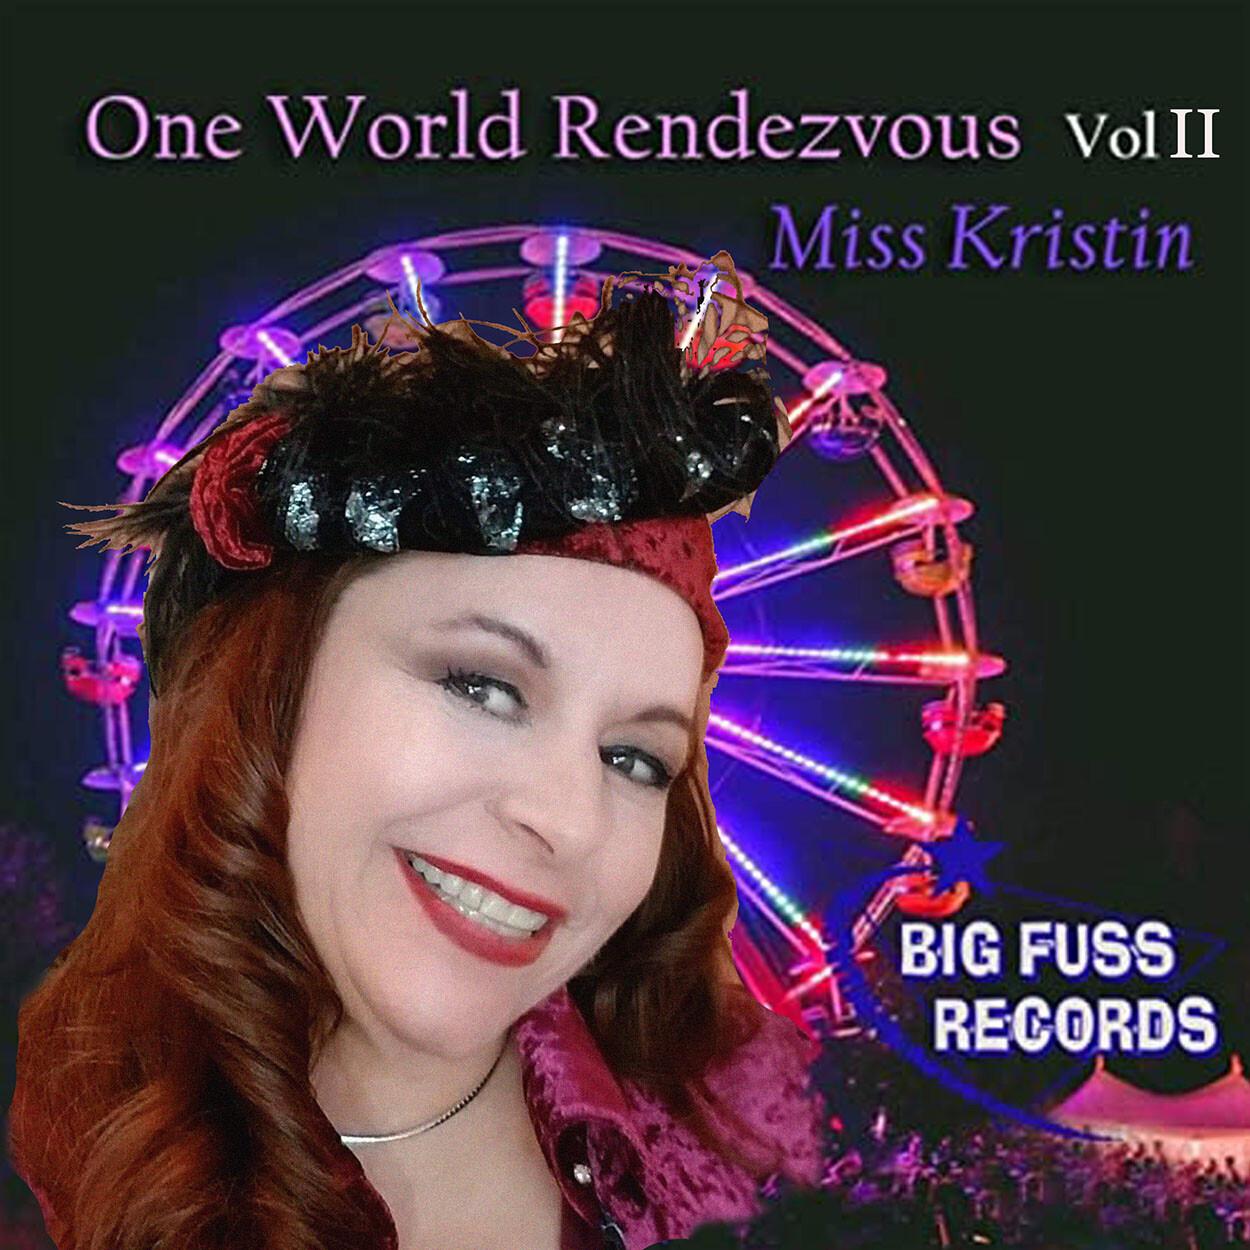 Miss Kristin, One World, Rendezvous, Vol II, Kristin, Kristen, Pedderson